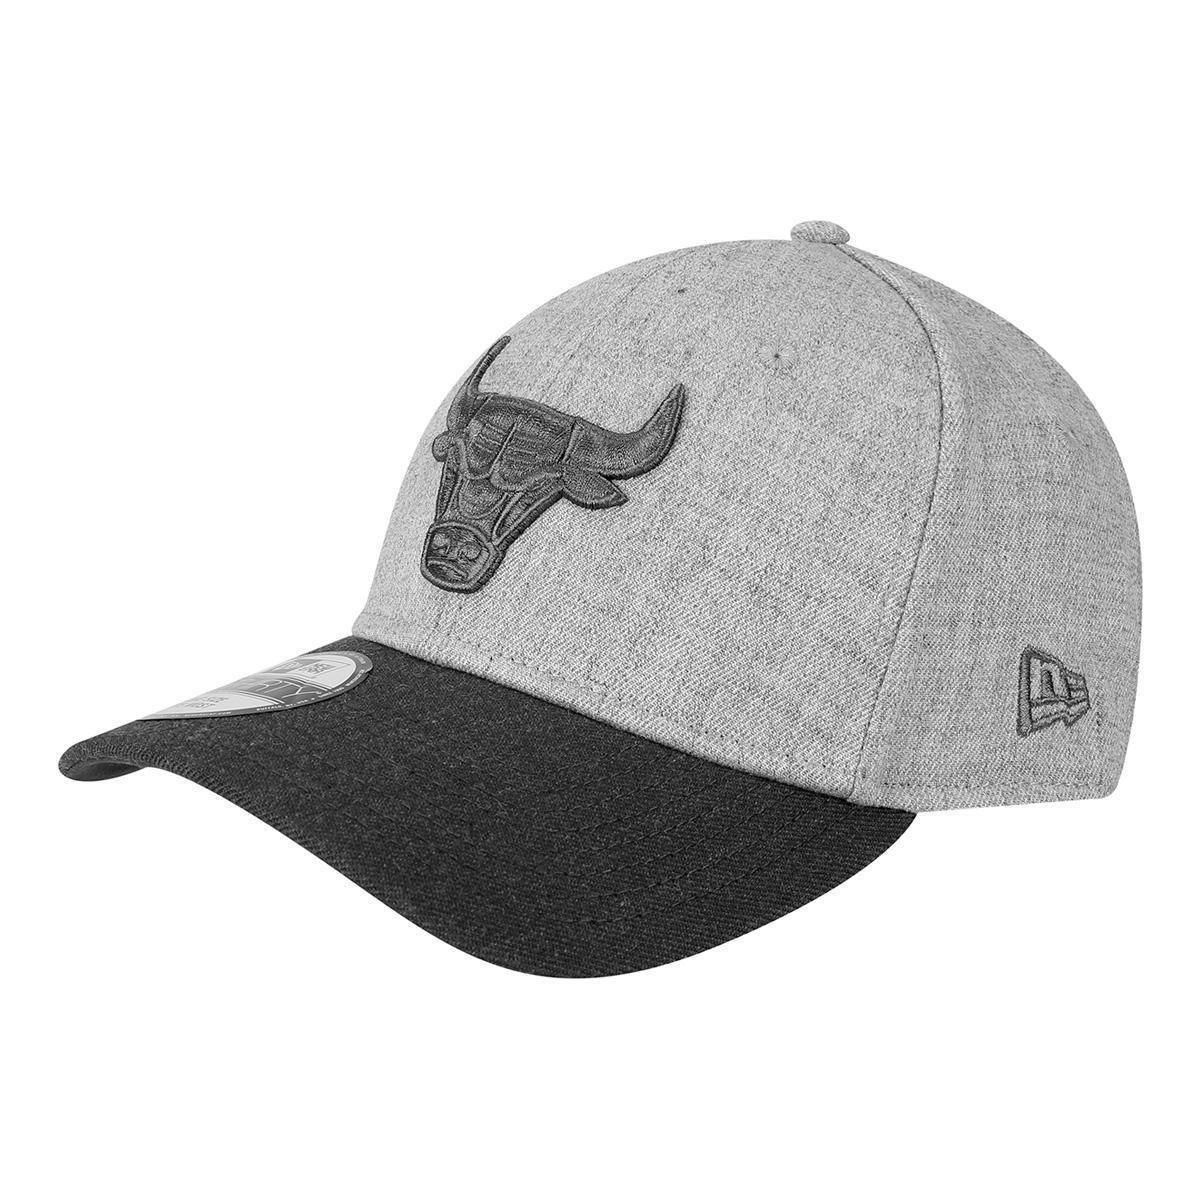 Boné New Era NBA Chicago Bulls Aba Curva 3930 Heather - Compre Agora ... b0417e748f9